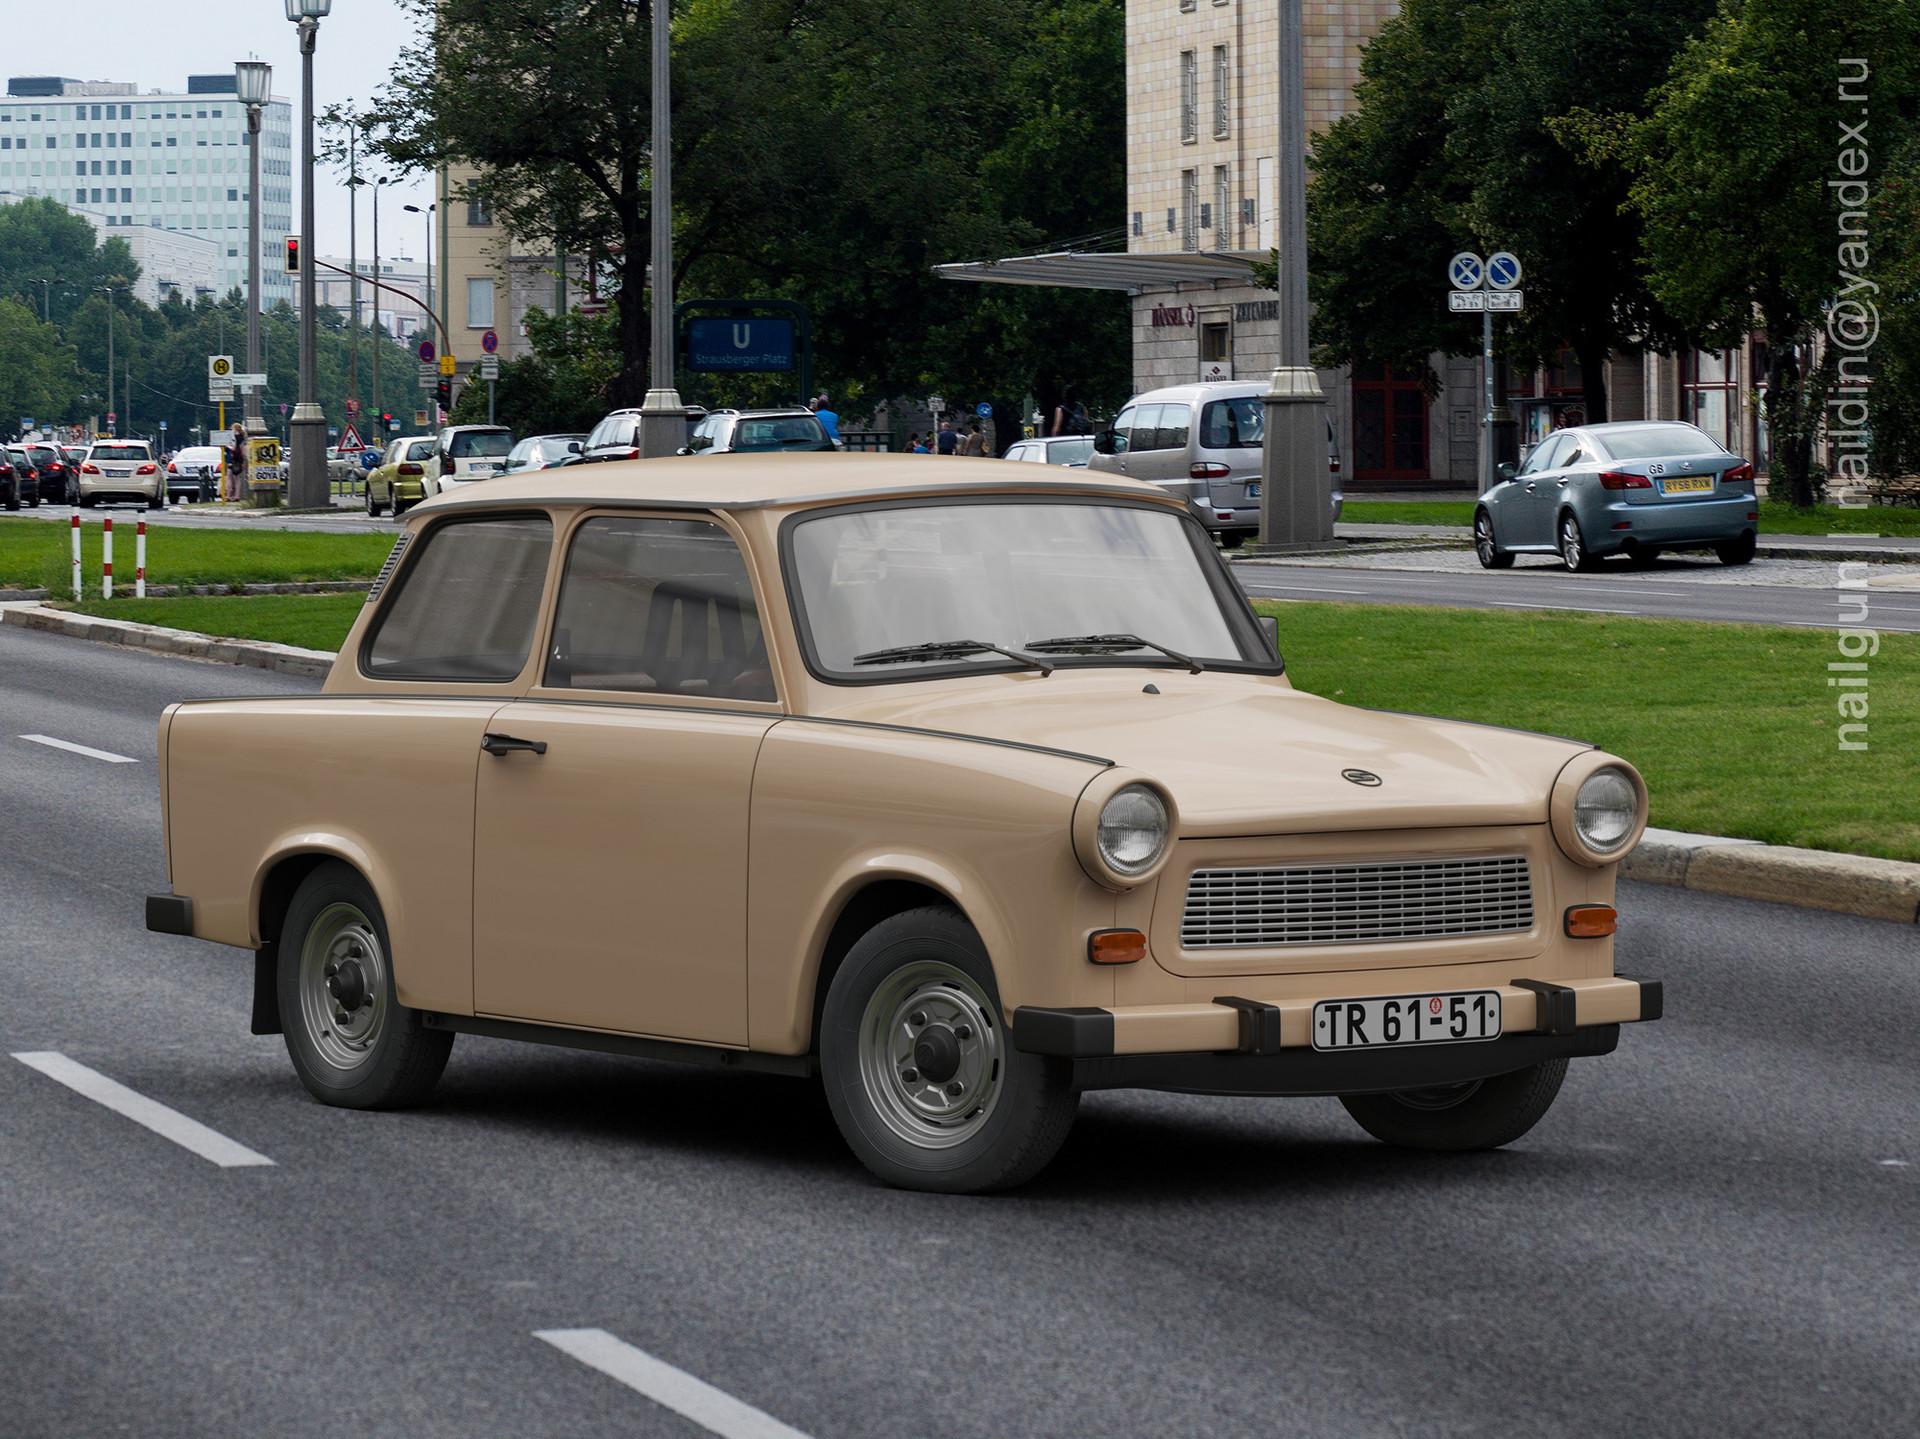 Nail khusnutdinov als 151 010 trabant limo central page 3x